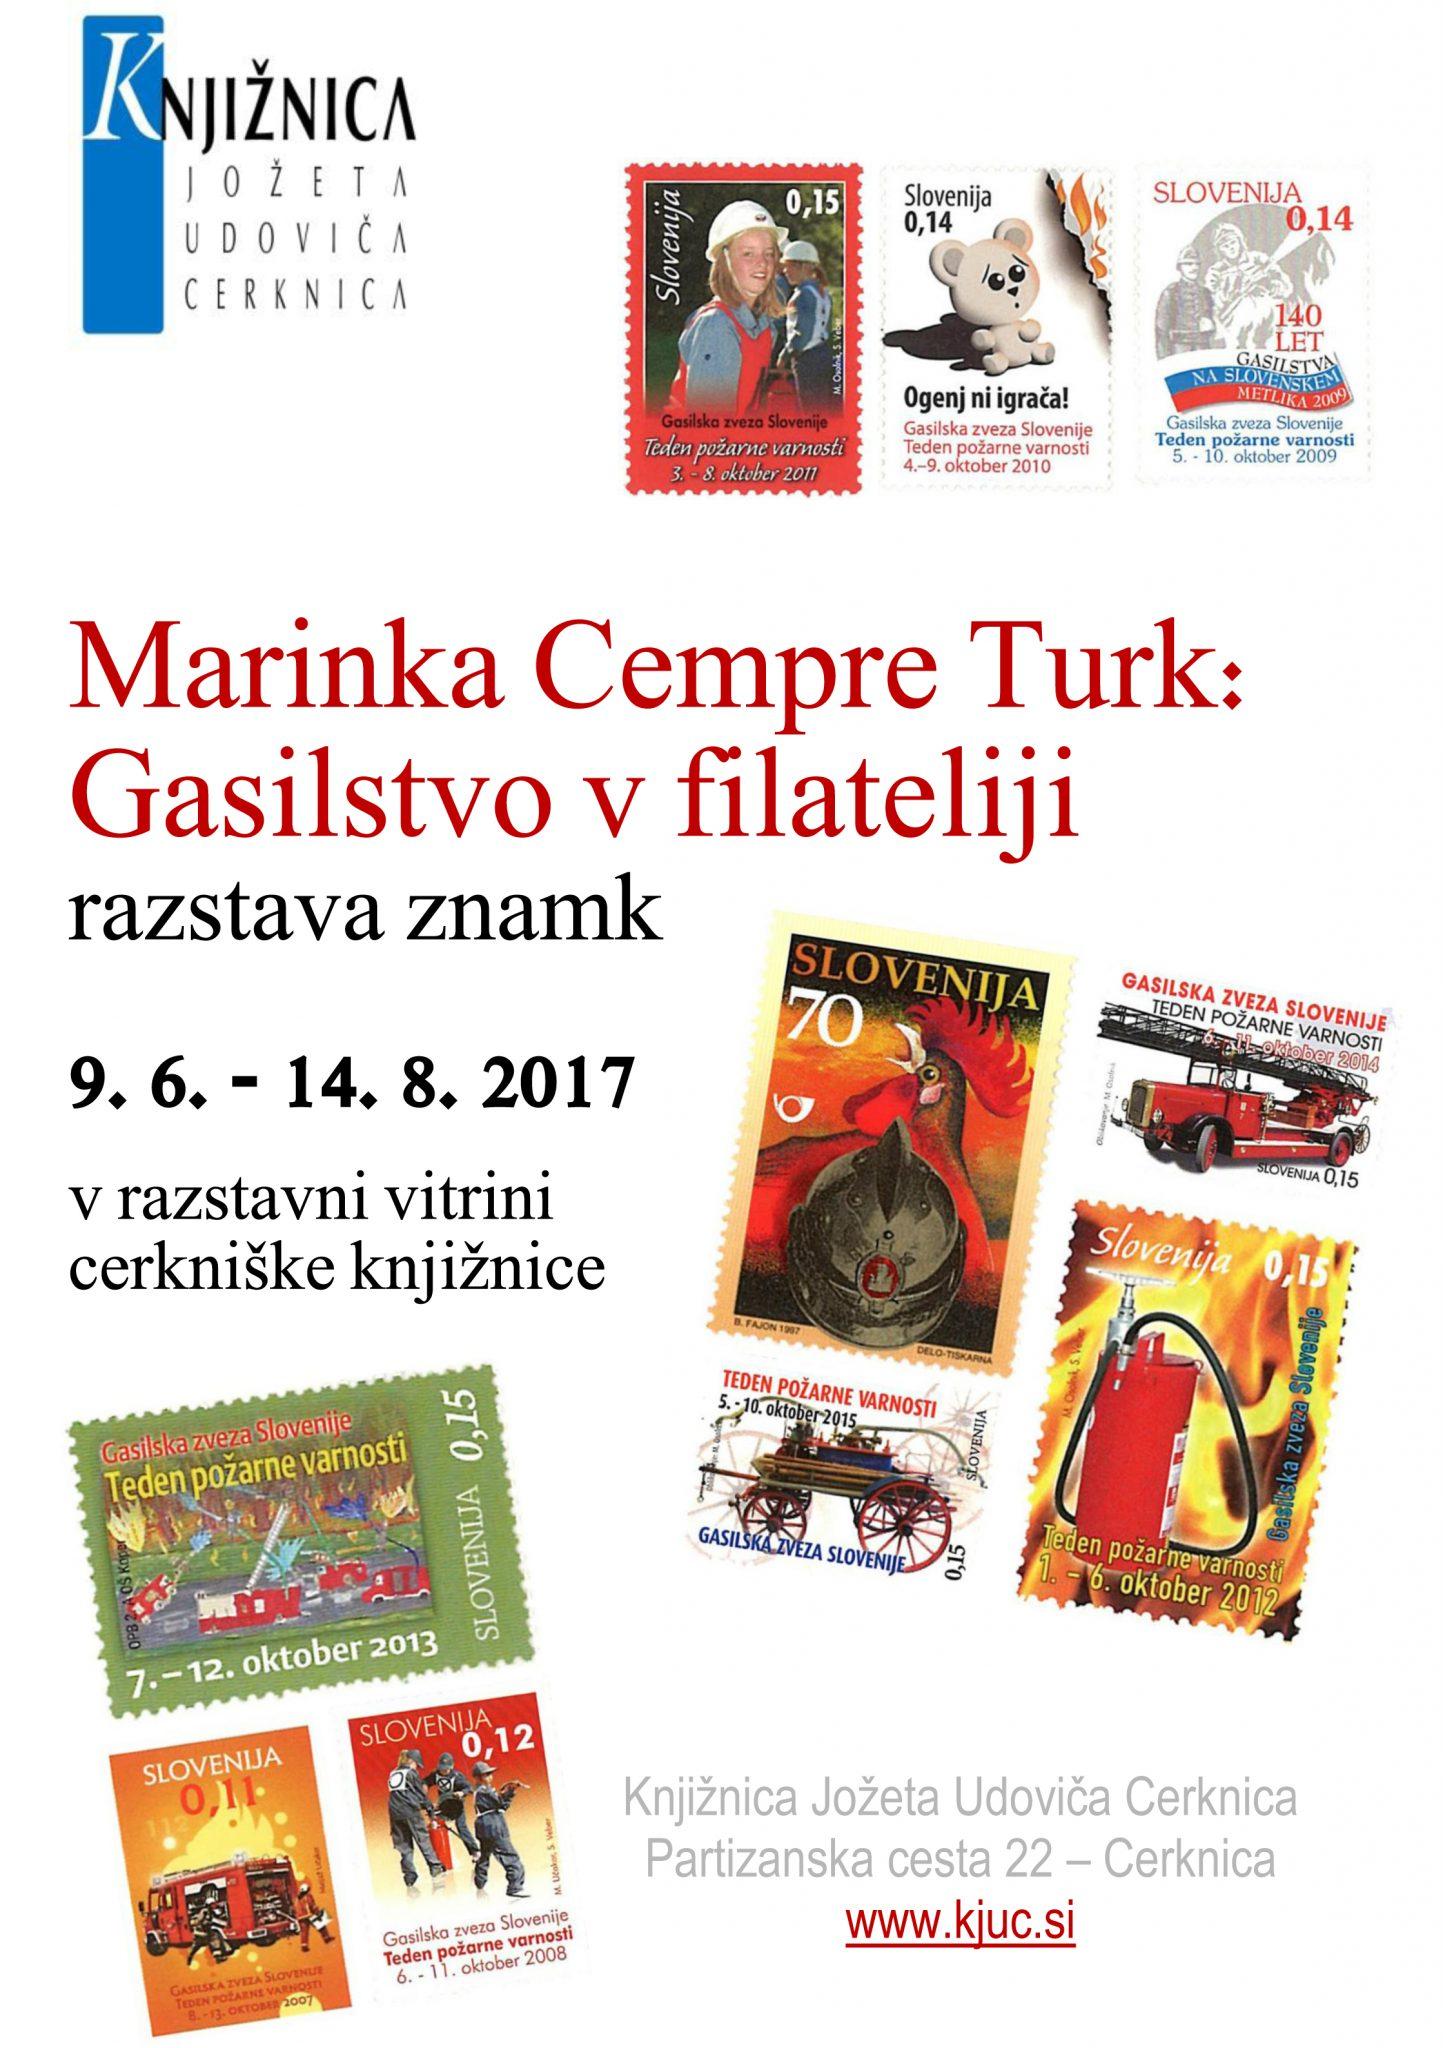 vabilo kopija - Marinka Cempre Turk: Gasilstvo v filateliji